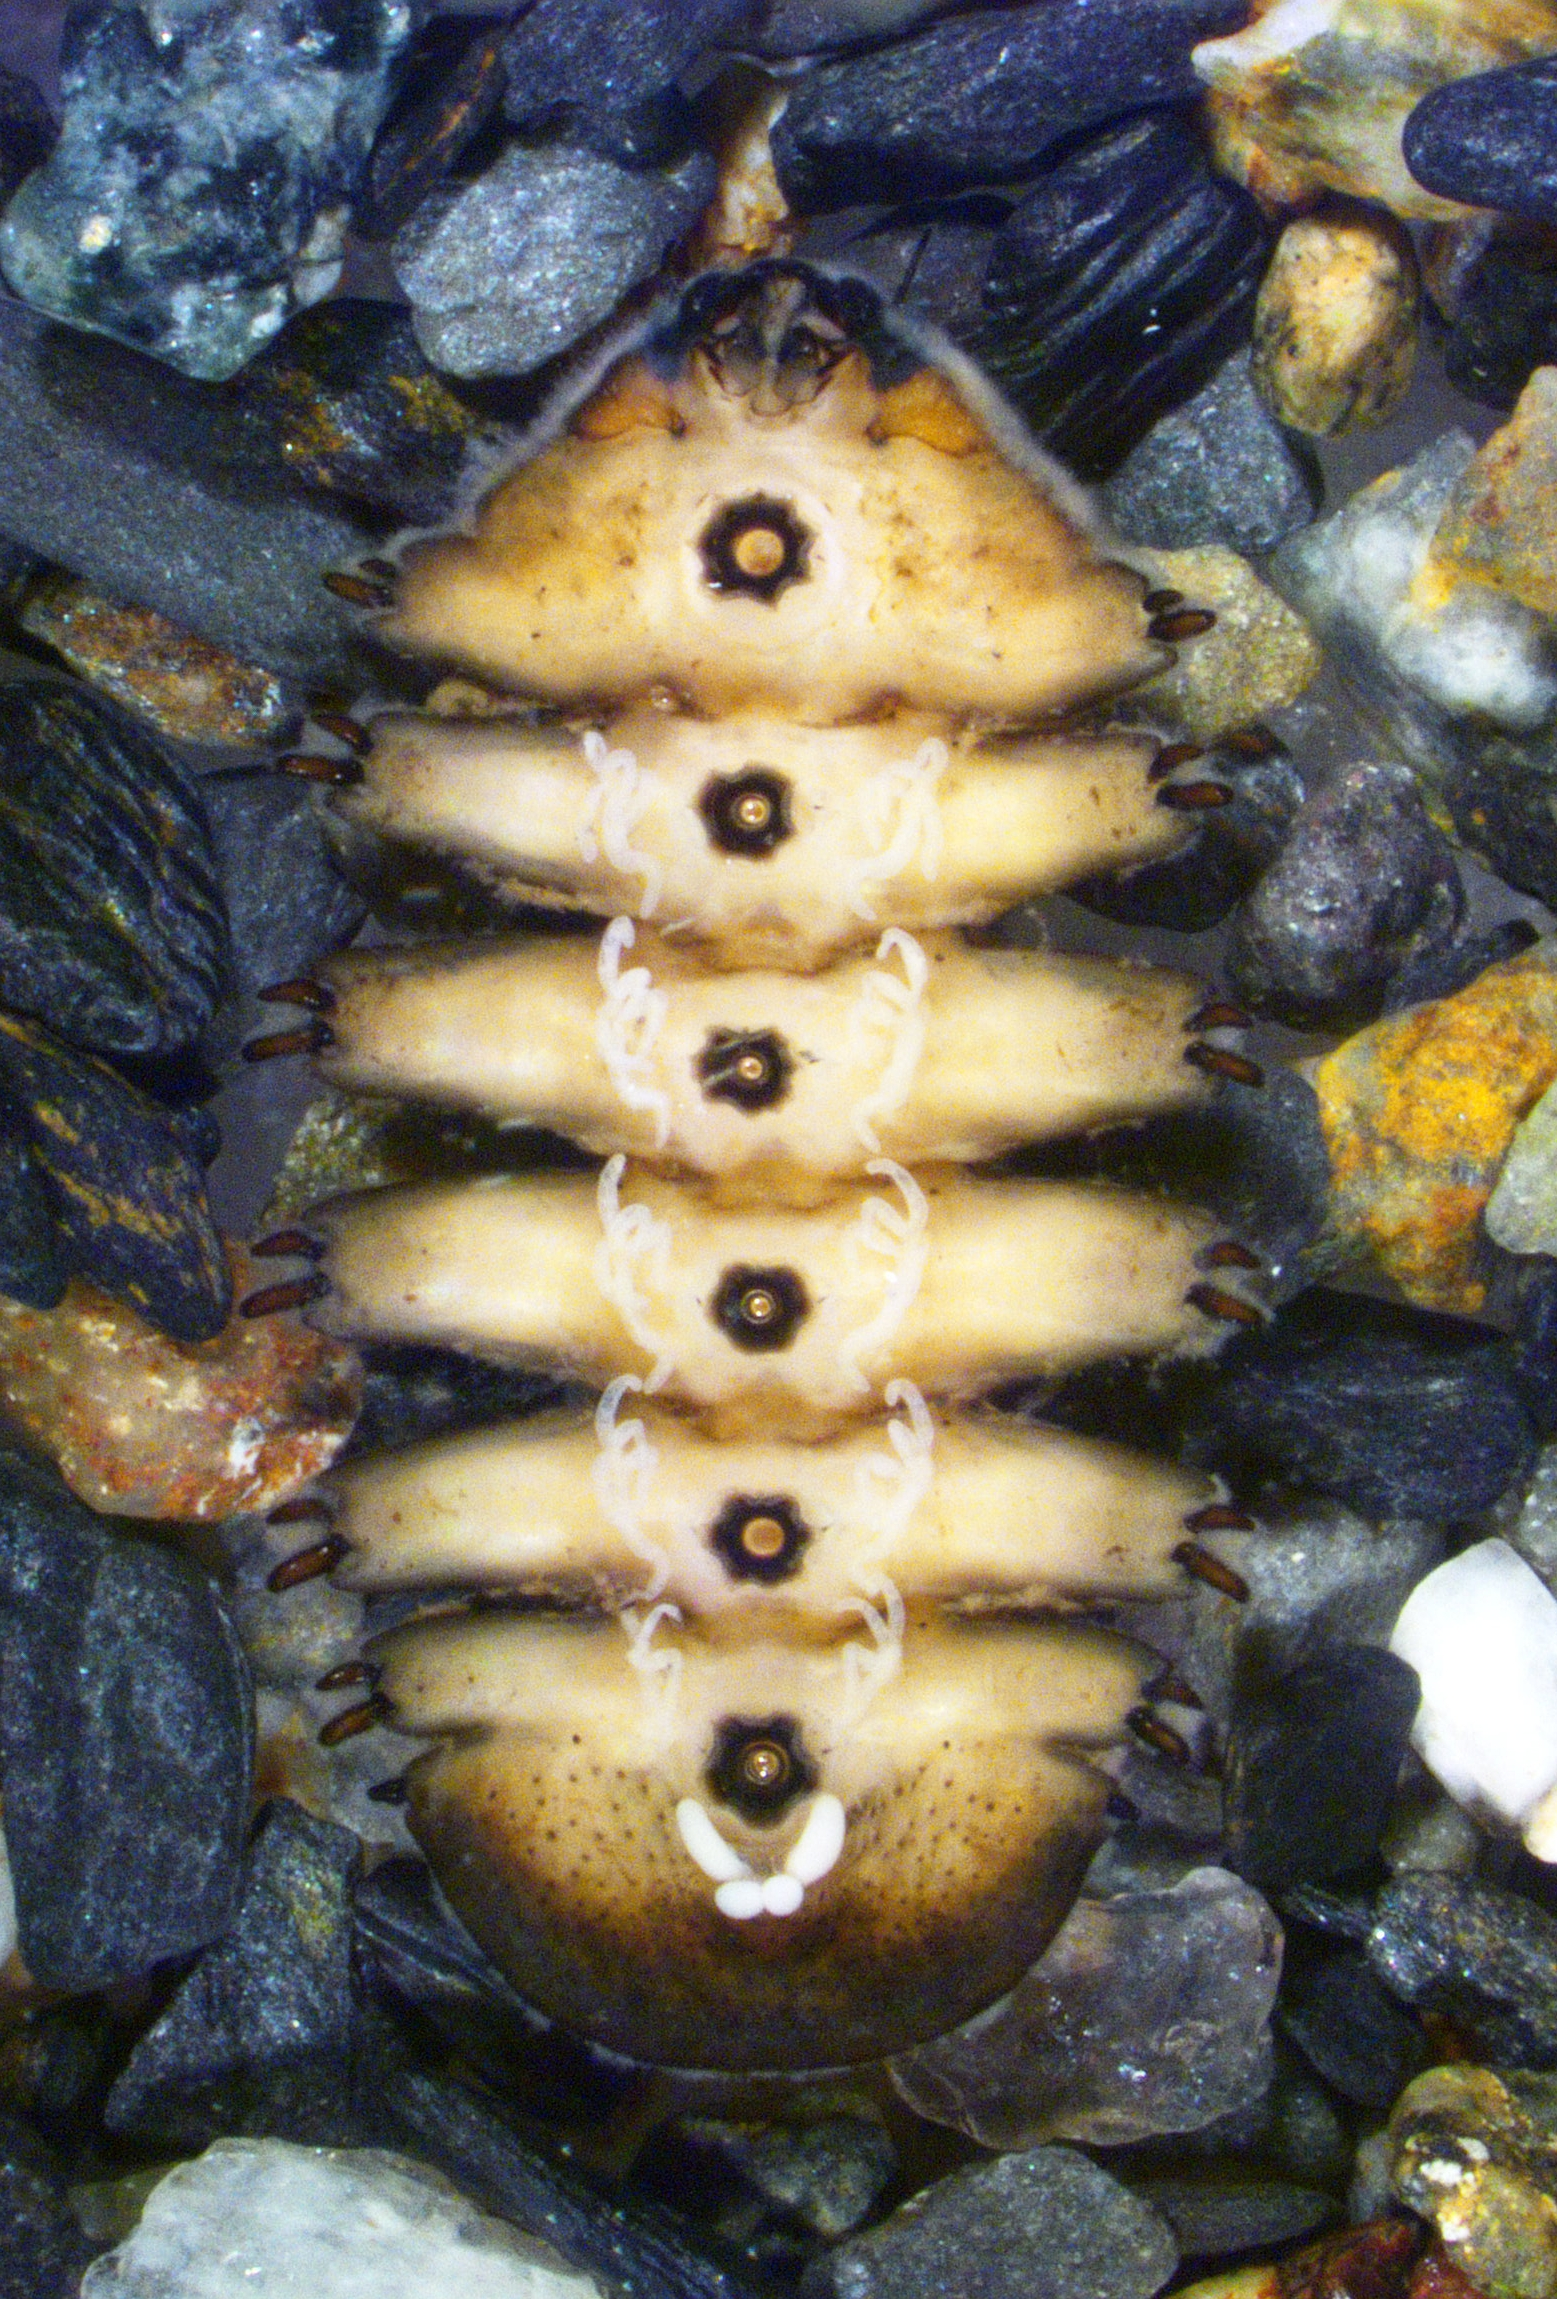 Larvae under microscope - photo by Alex Mykris